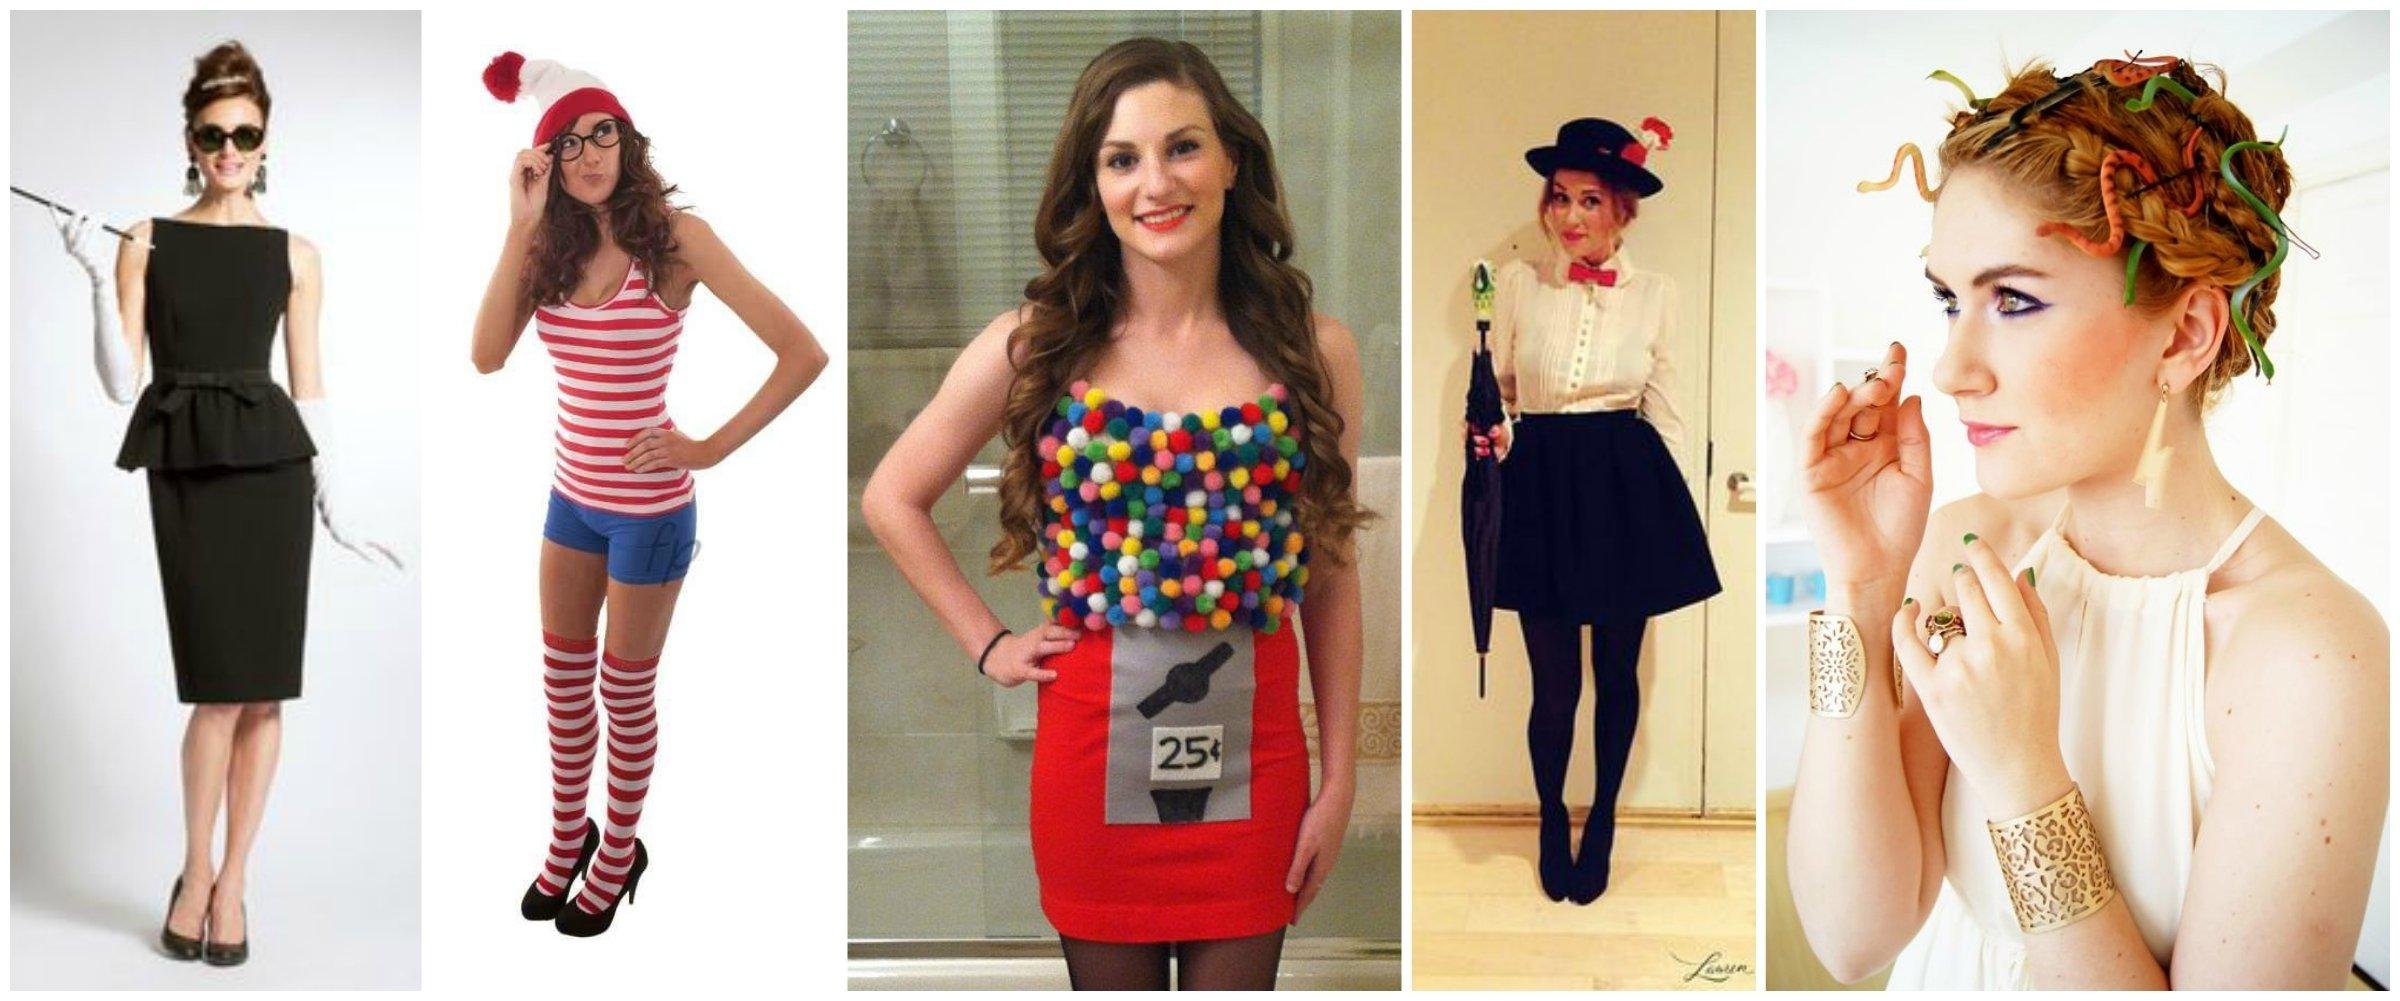 10 Best Teenage Girl Halloween Costume Ideas Homemade image gallery homemade halloween costumes girls diy halloween  sc 1 st  Unique Ideas 2018 & 10 Best Teenage Girl Halloween Costume Ideas Homemade